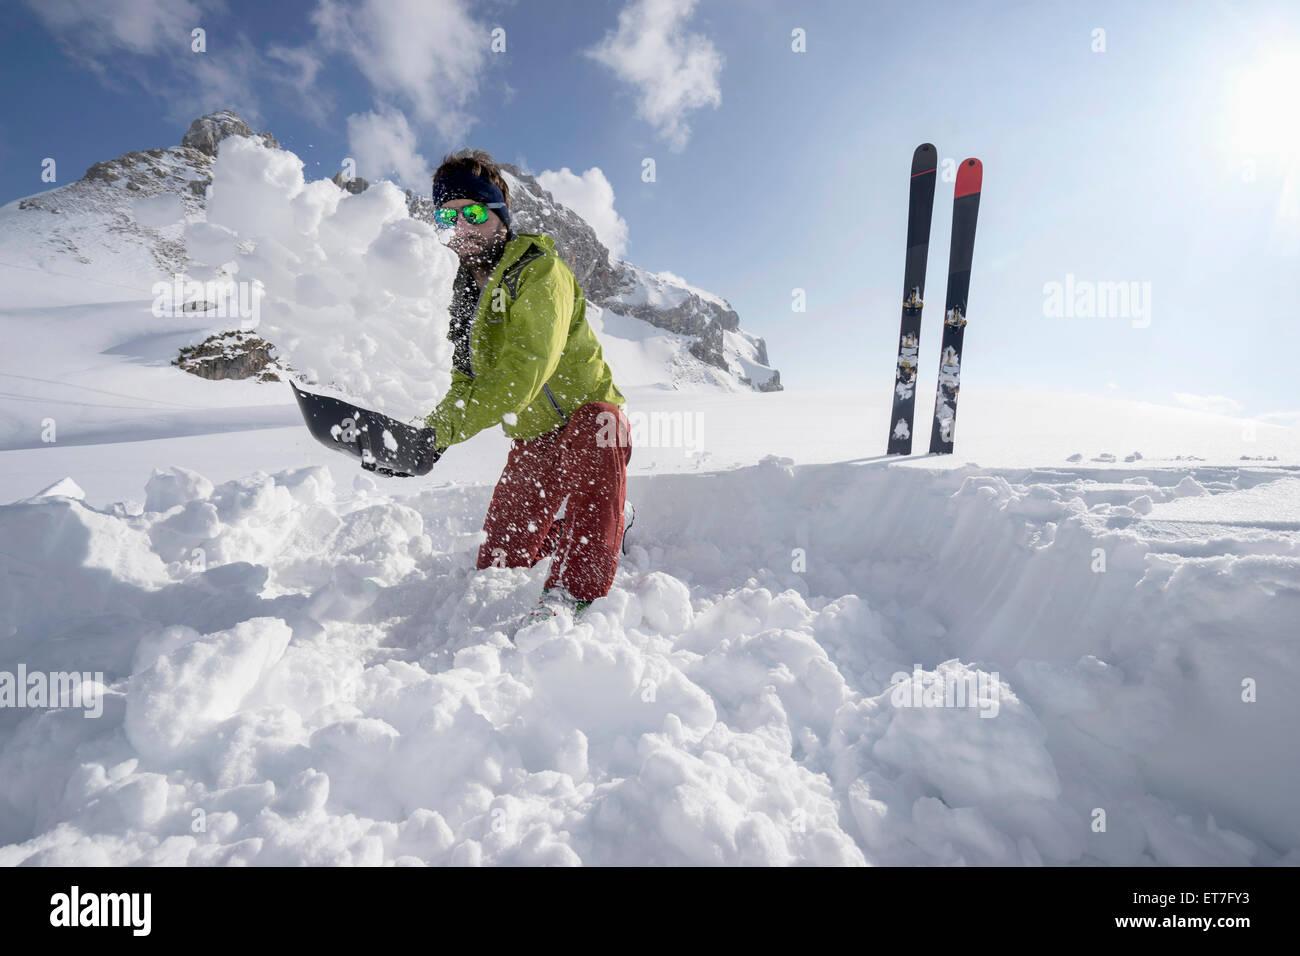 Man shovelling snow for bivouac camp, Tyrol, Austria - Stock Image